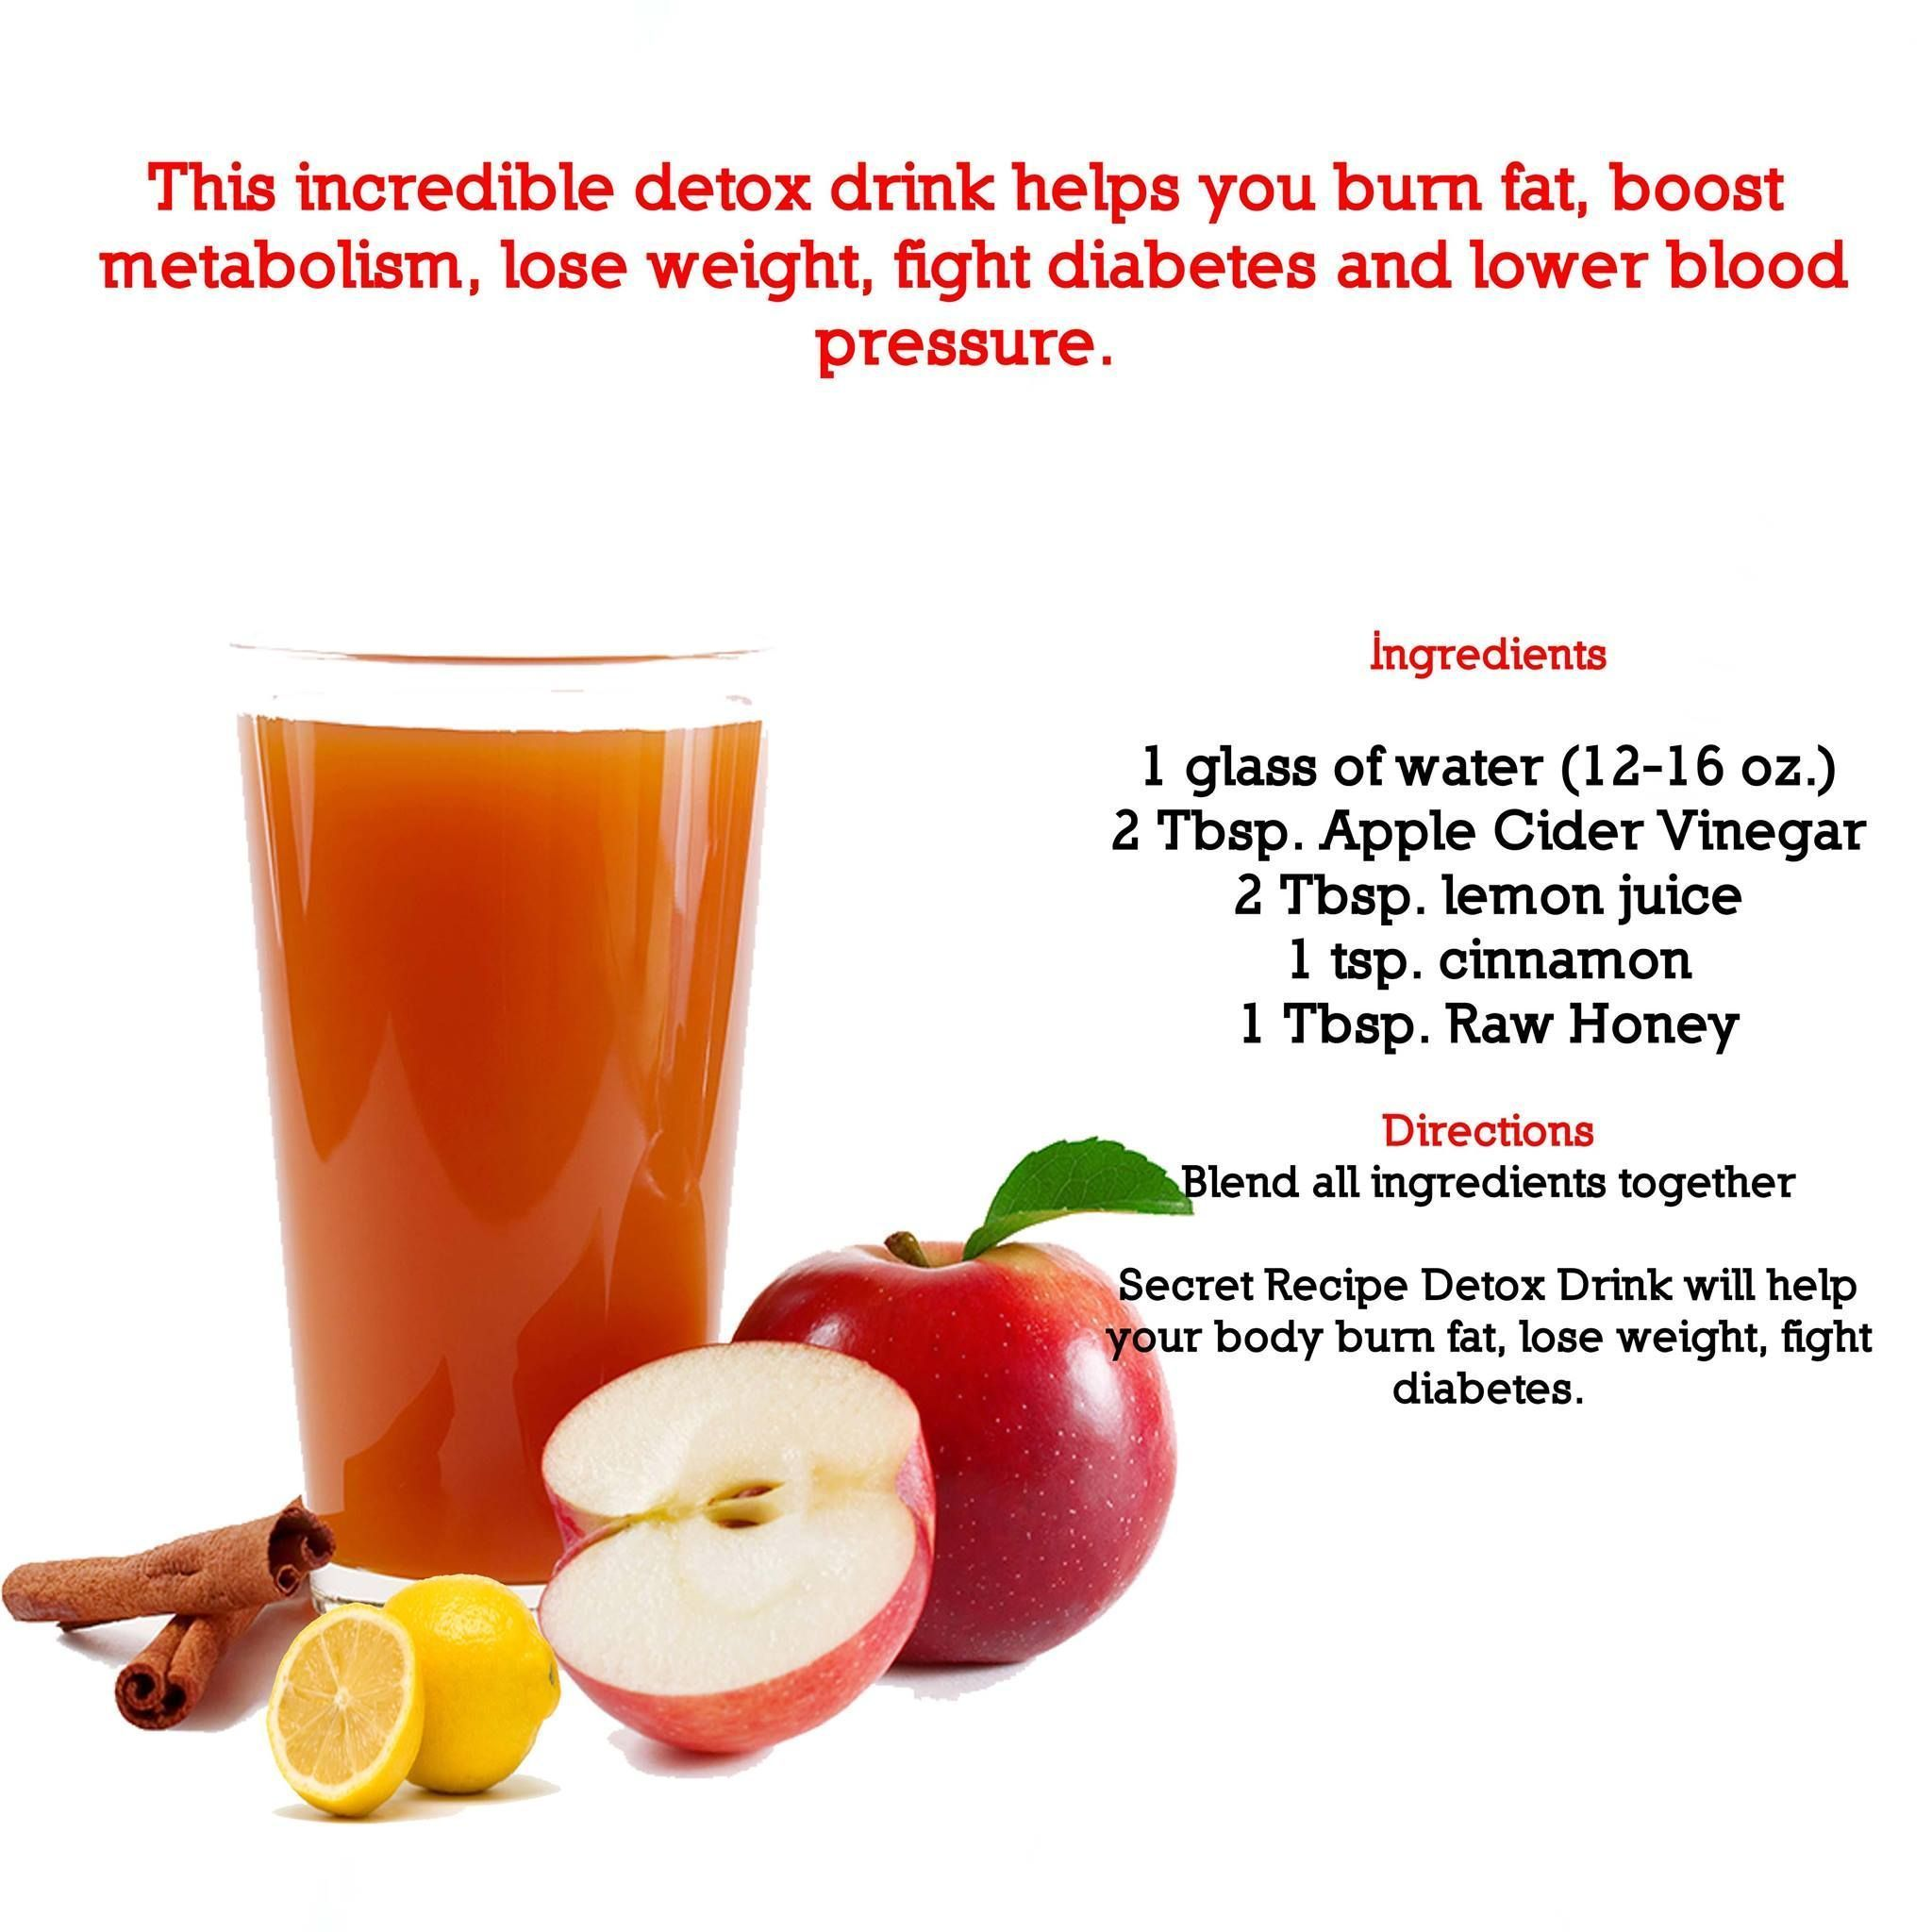 Incredible detox drink made with acv apple cider vinegarbraggus